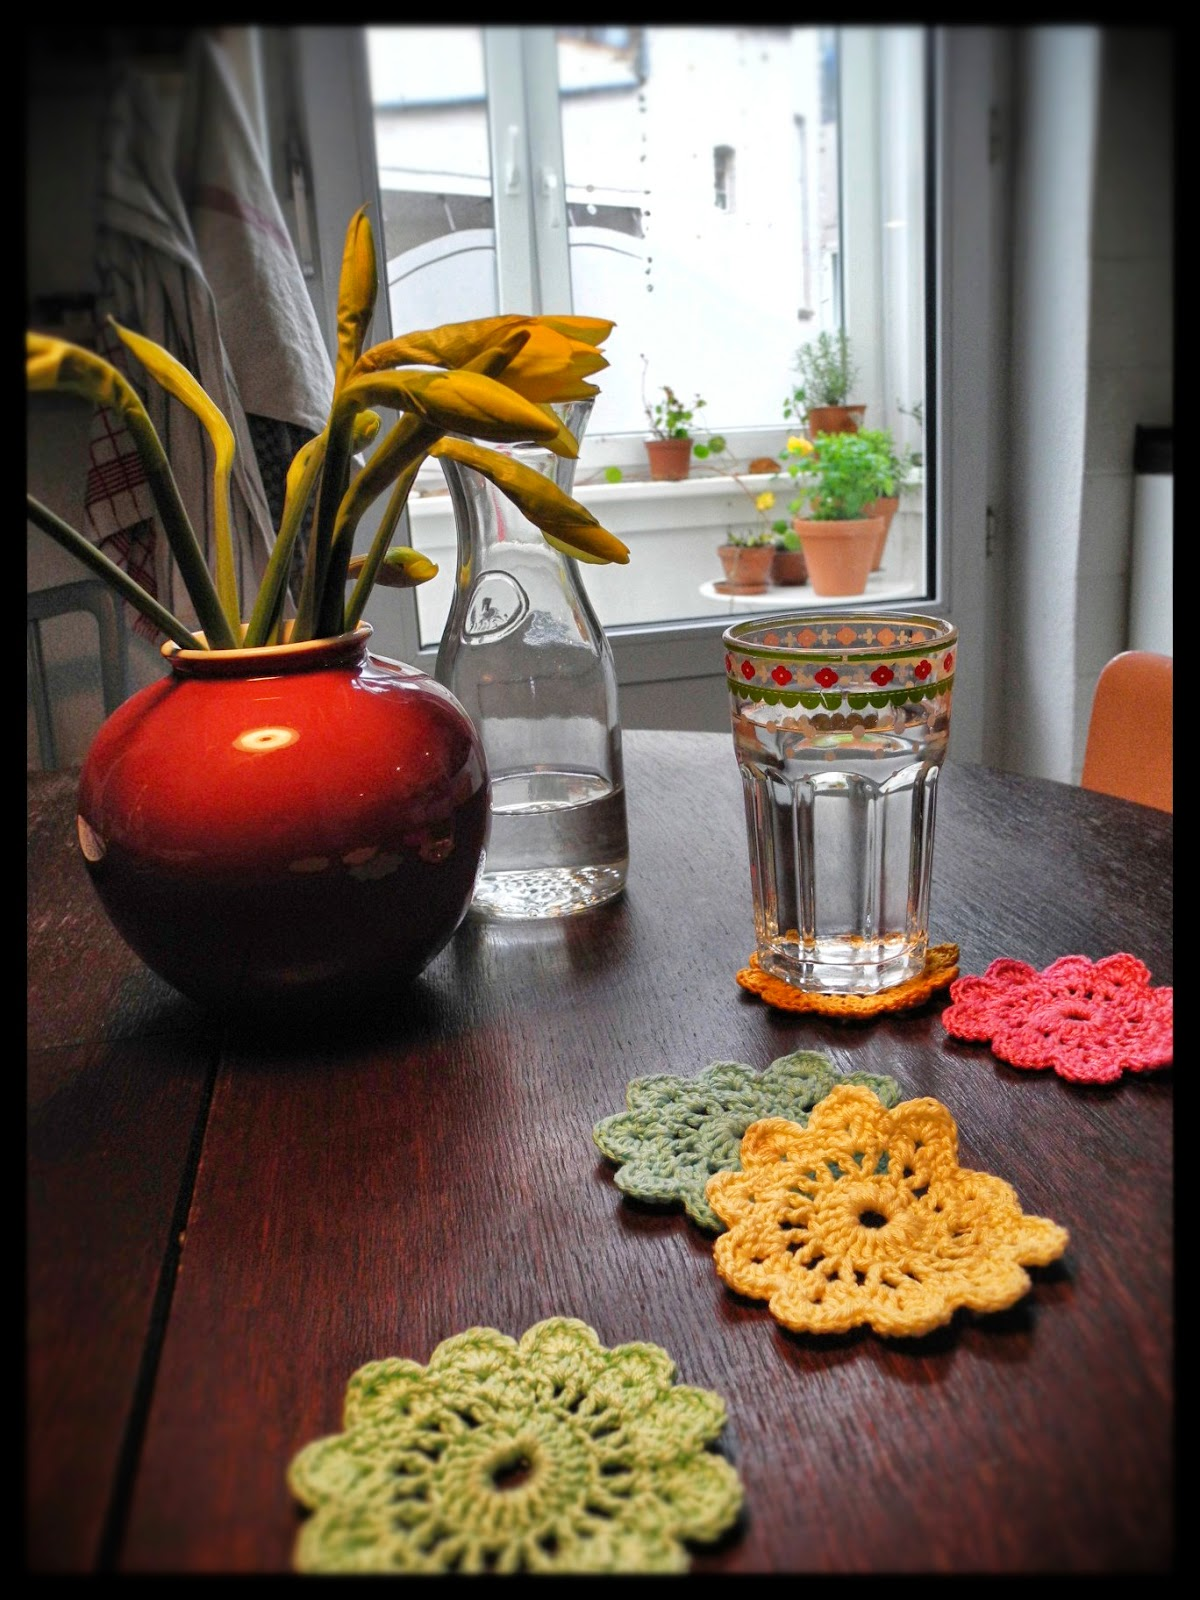 diy ausb chser in untersetzer f r tassen oder gl ser selber h keln. Black Bedroom Furniture Sets. Home Design Ideas